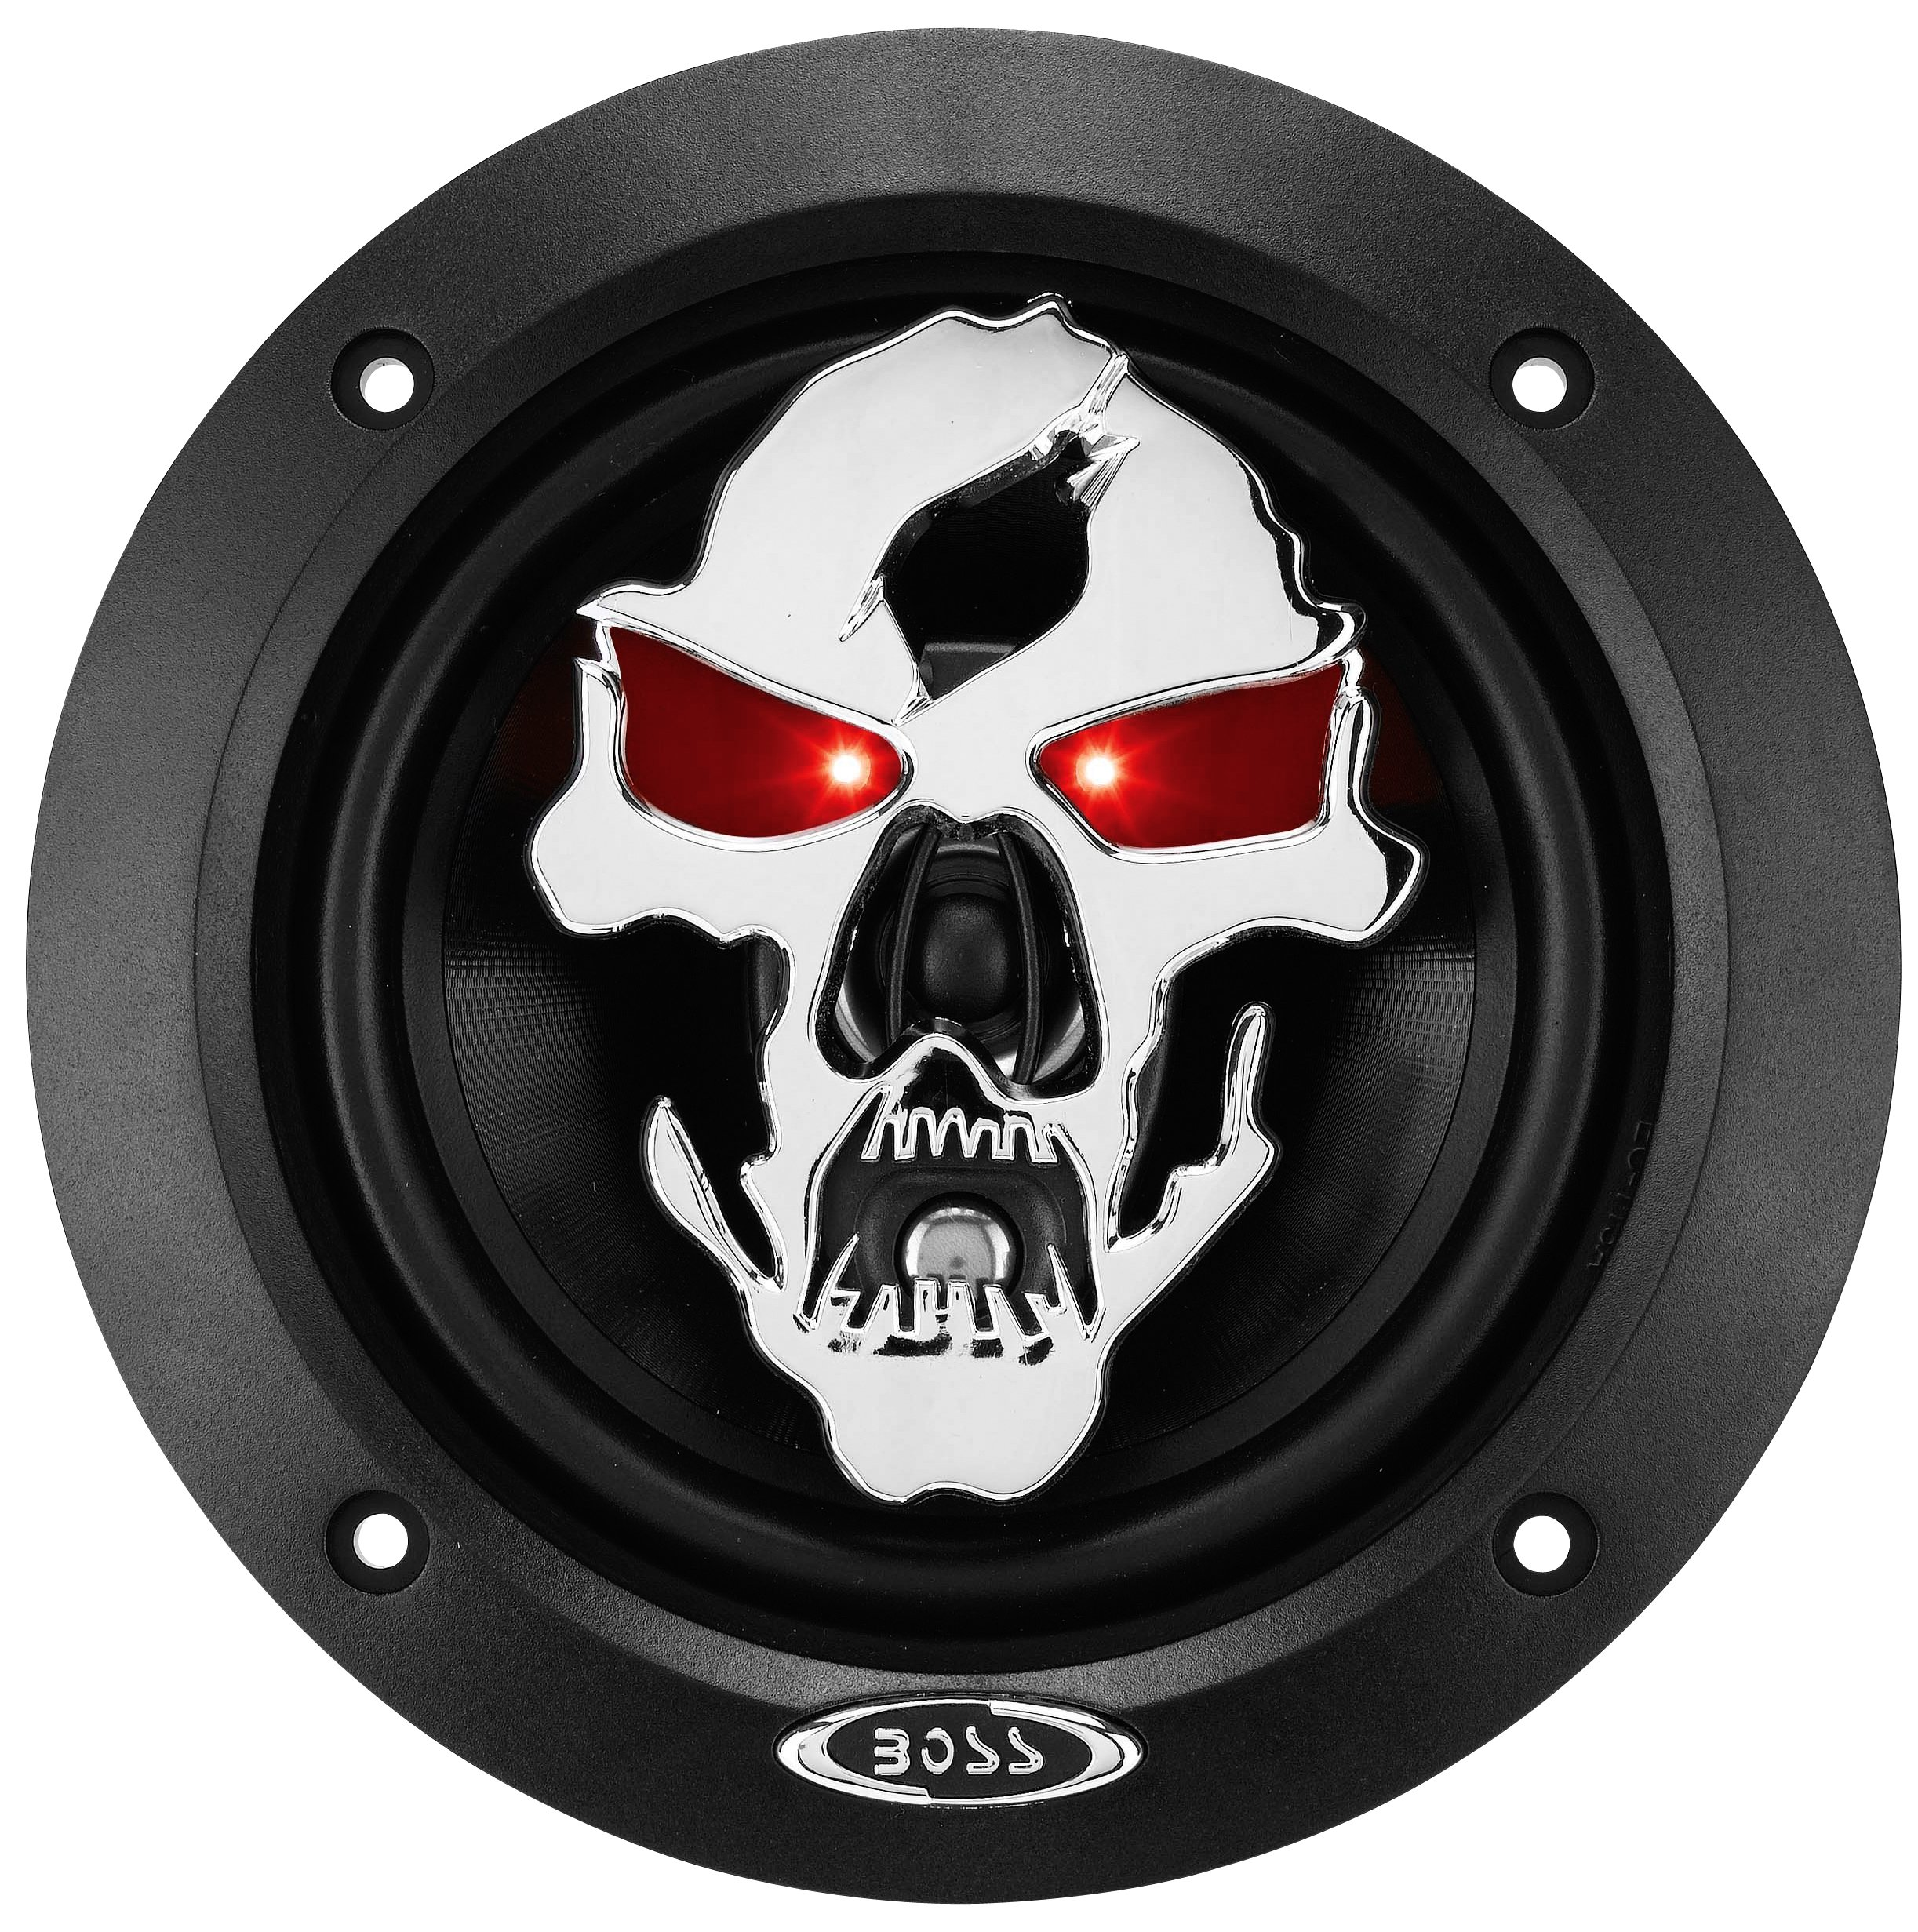 BOSS Audio SK553 275 Watt (Per Pair), 5.25 Inch, Full Range, 3 Way Car Speakers (Sold in Pairs)